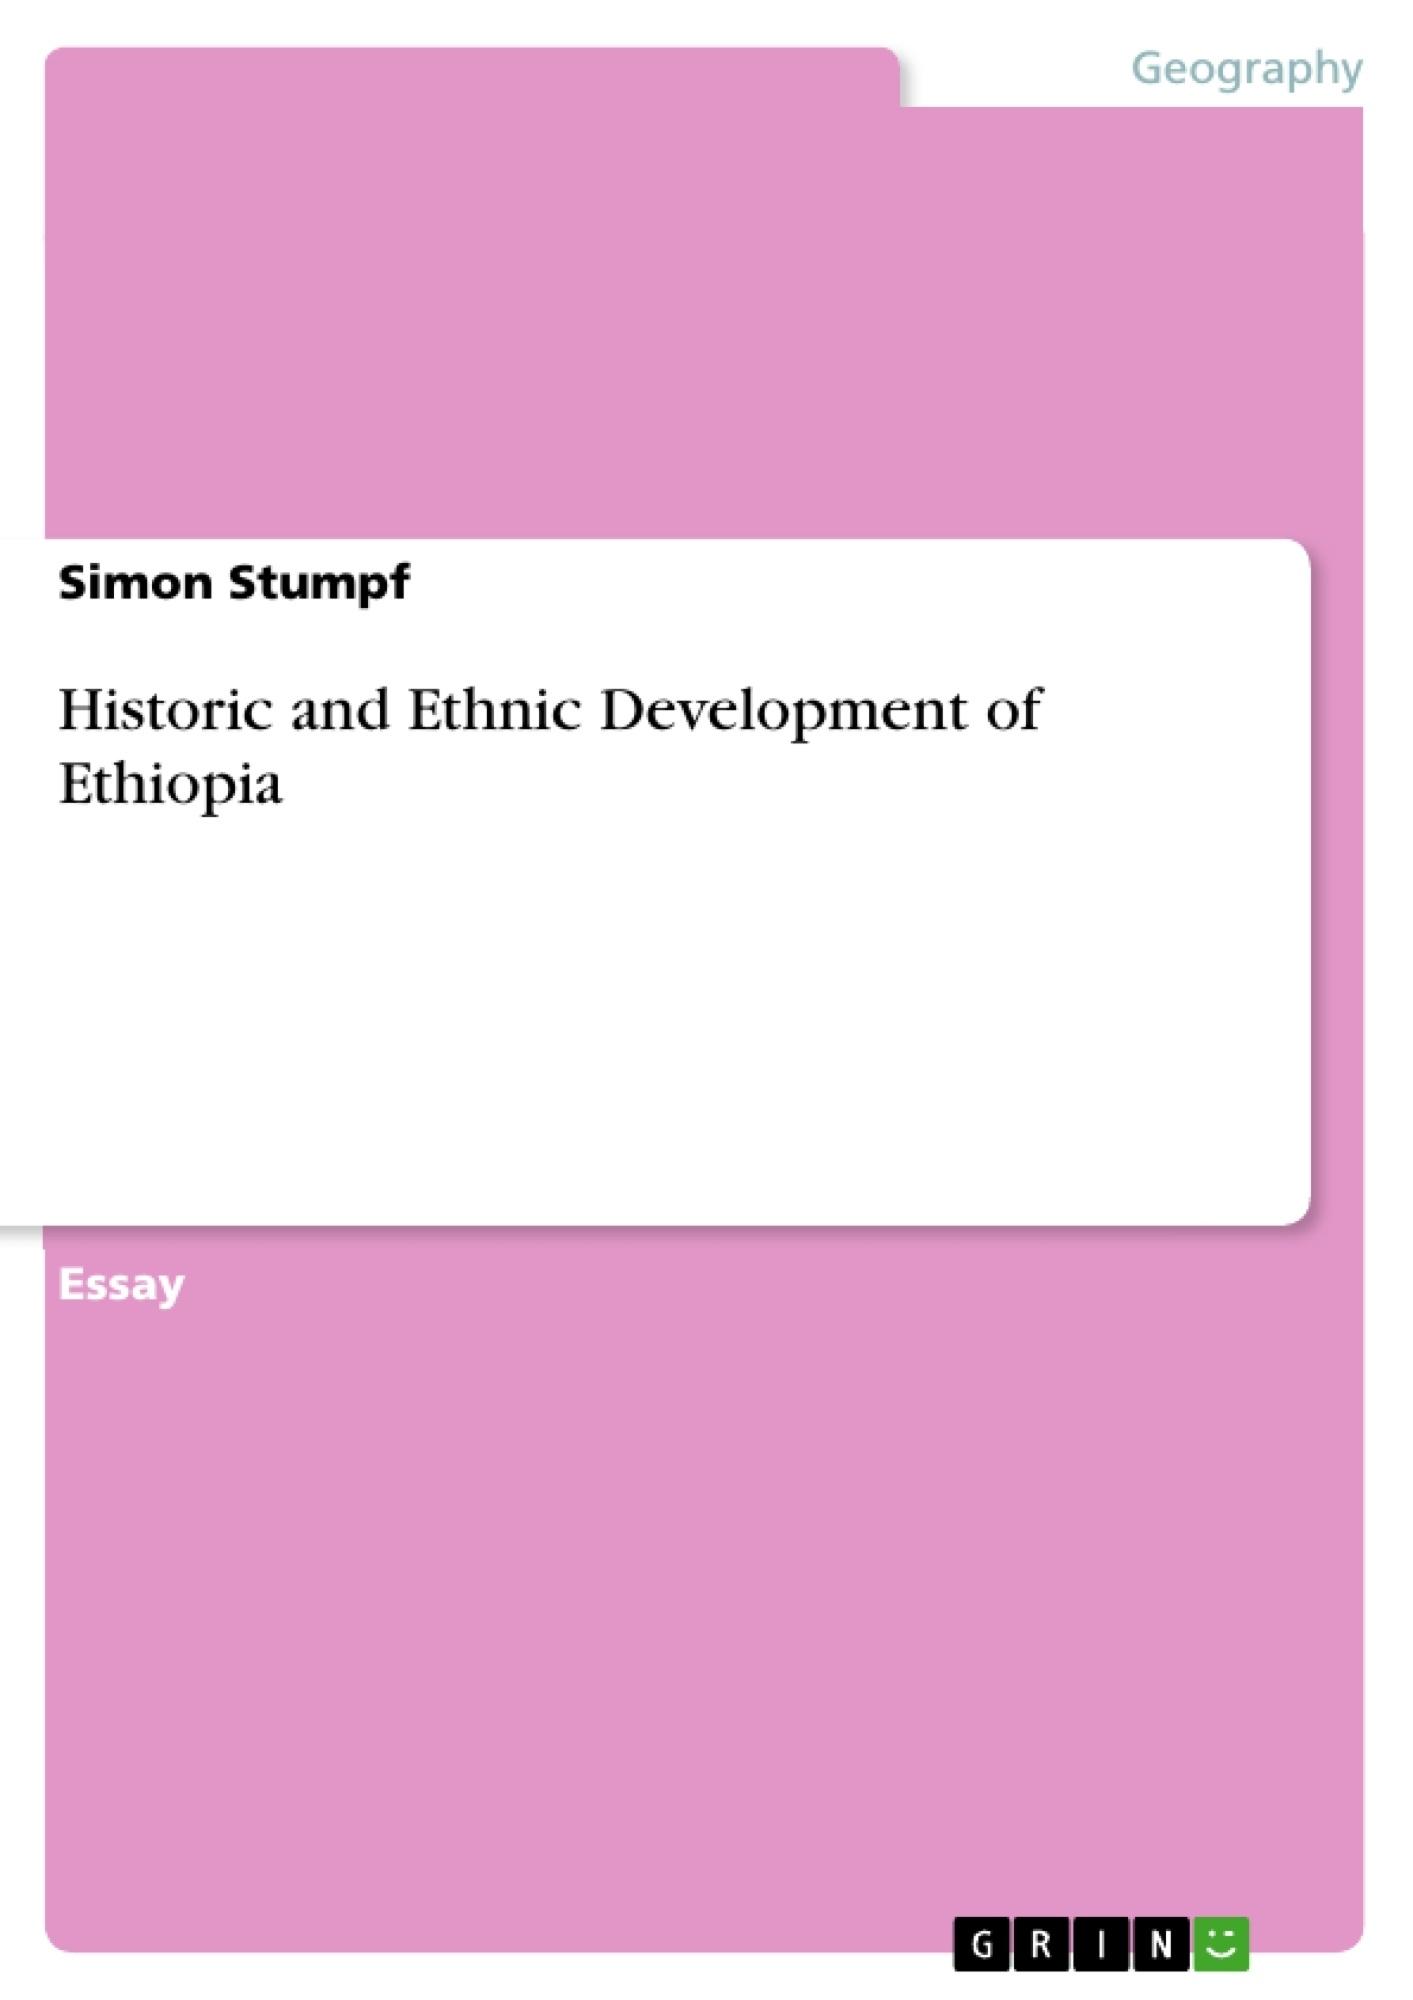 Title: Historic and Ethnic Development of Ethiopia